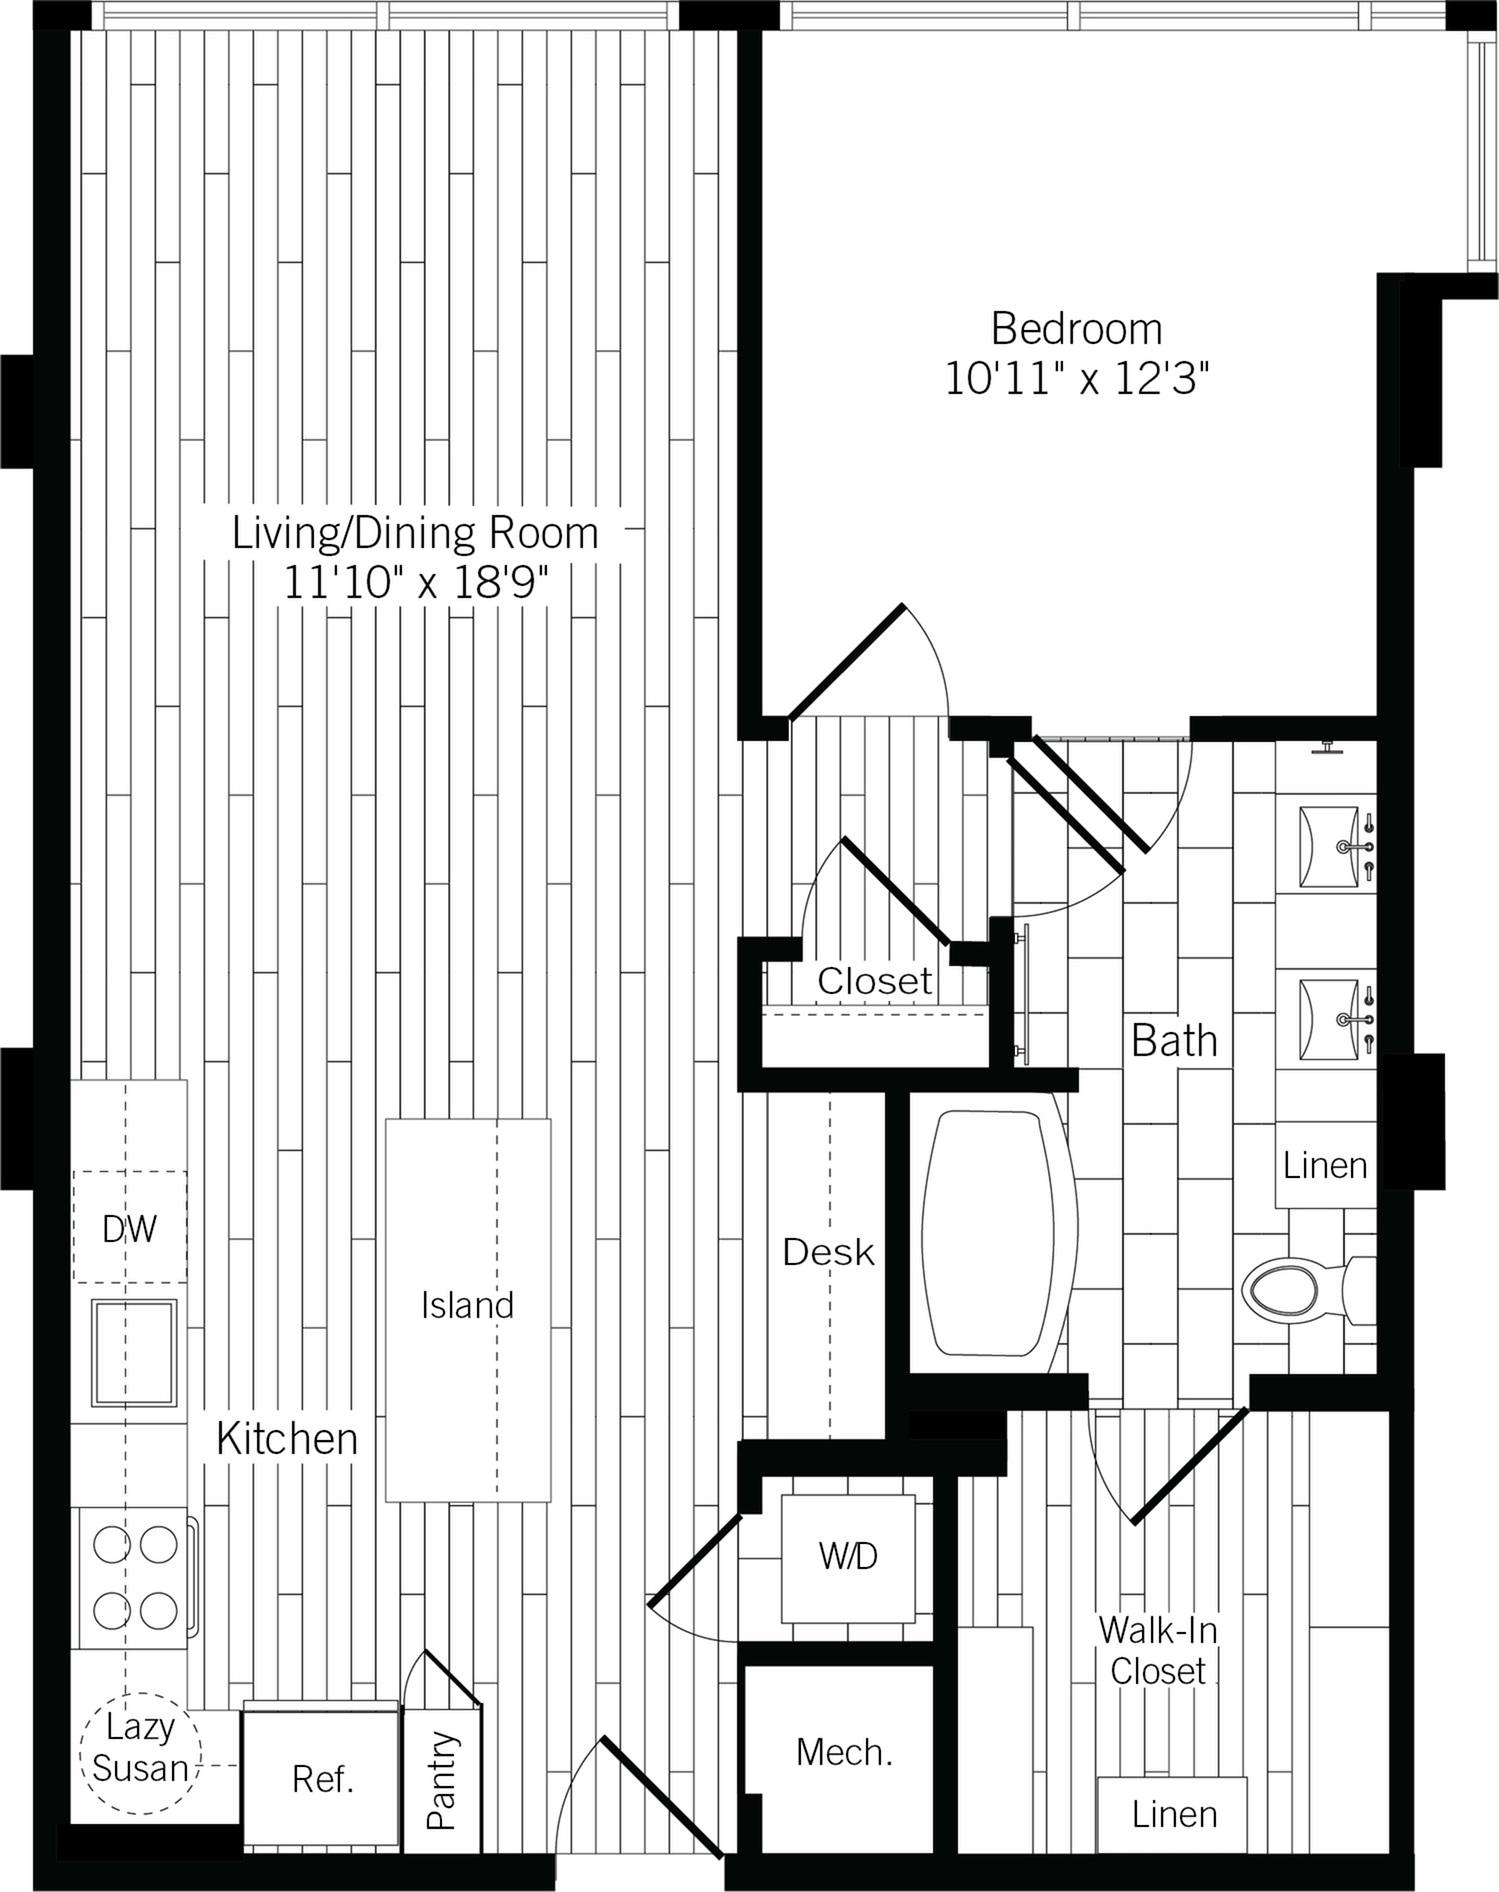 827 square foot one bedroom one bath apartment floorplan image